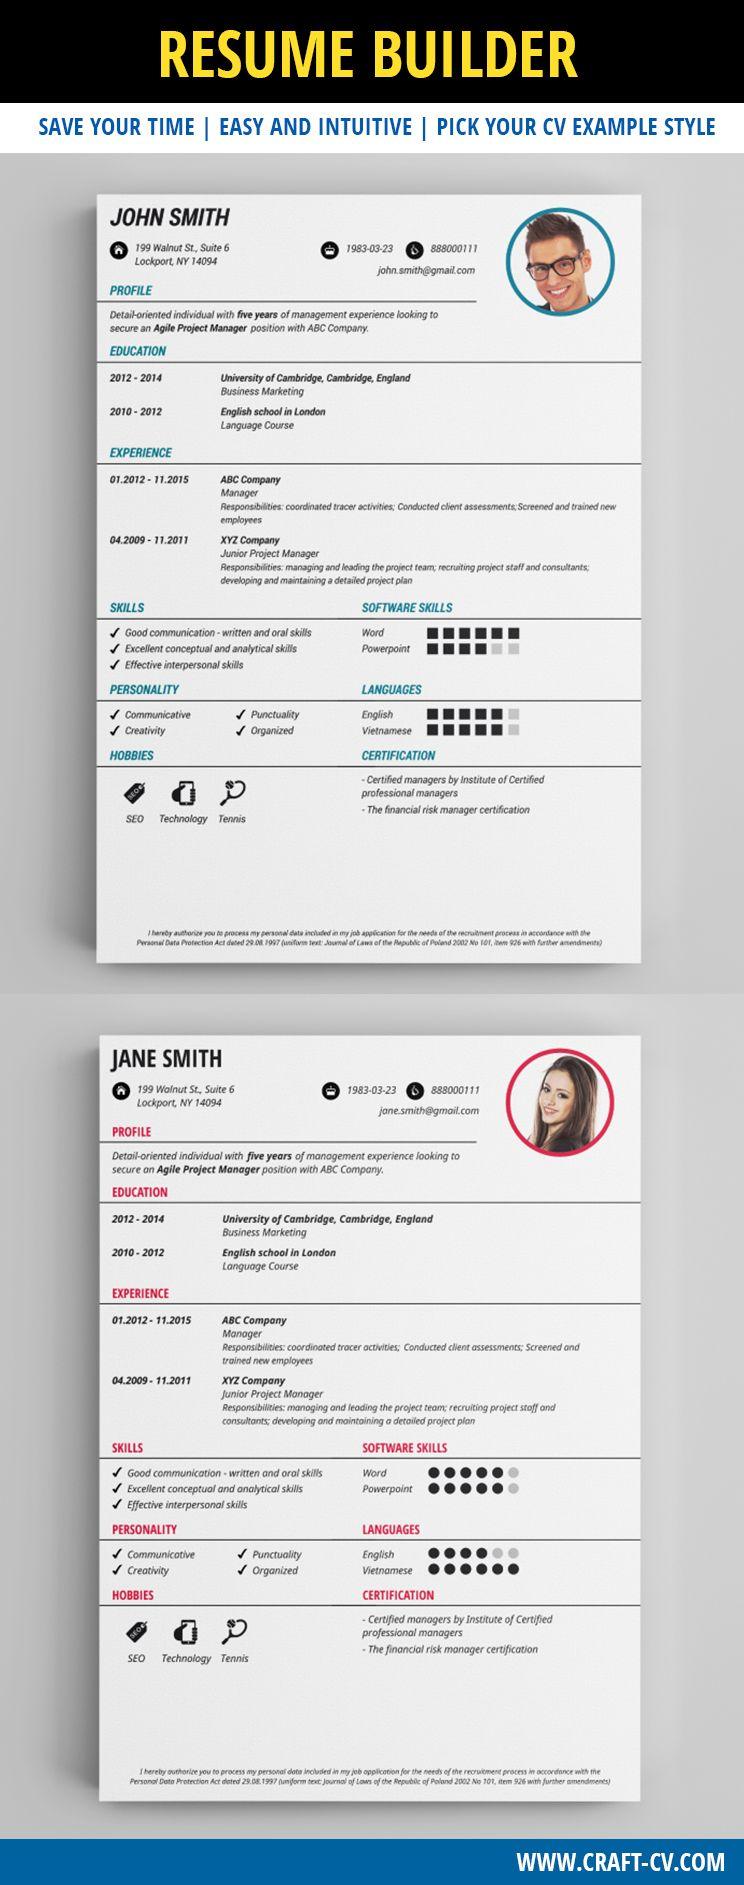 Free CV Template - Classic CV #freeresume #freecv #resume | Creative ...